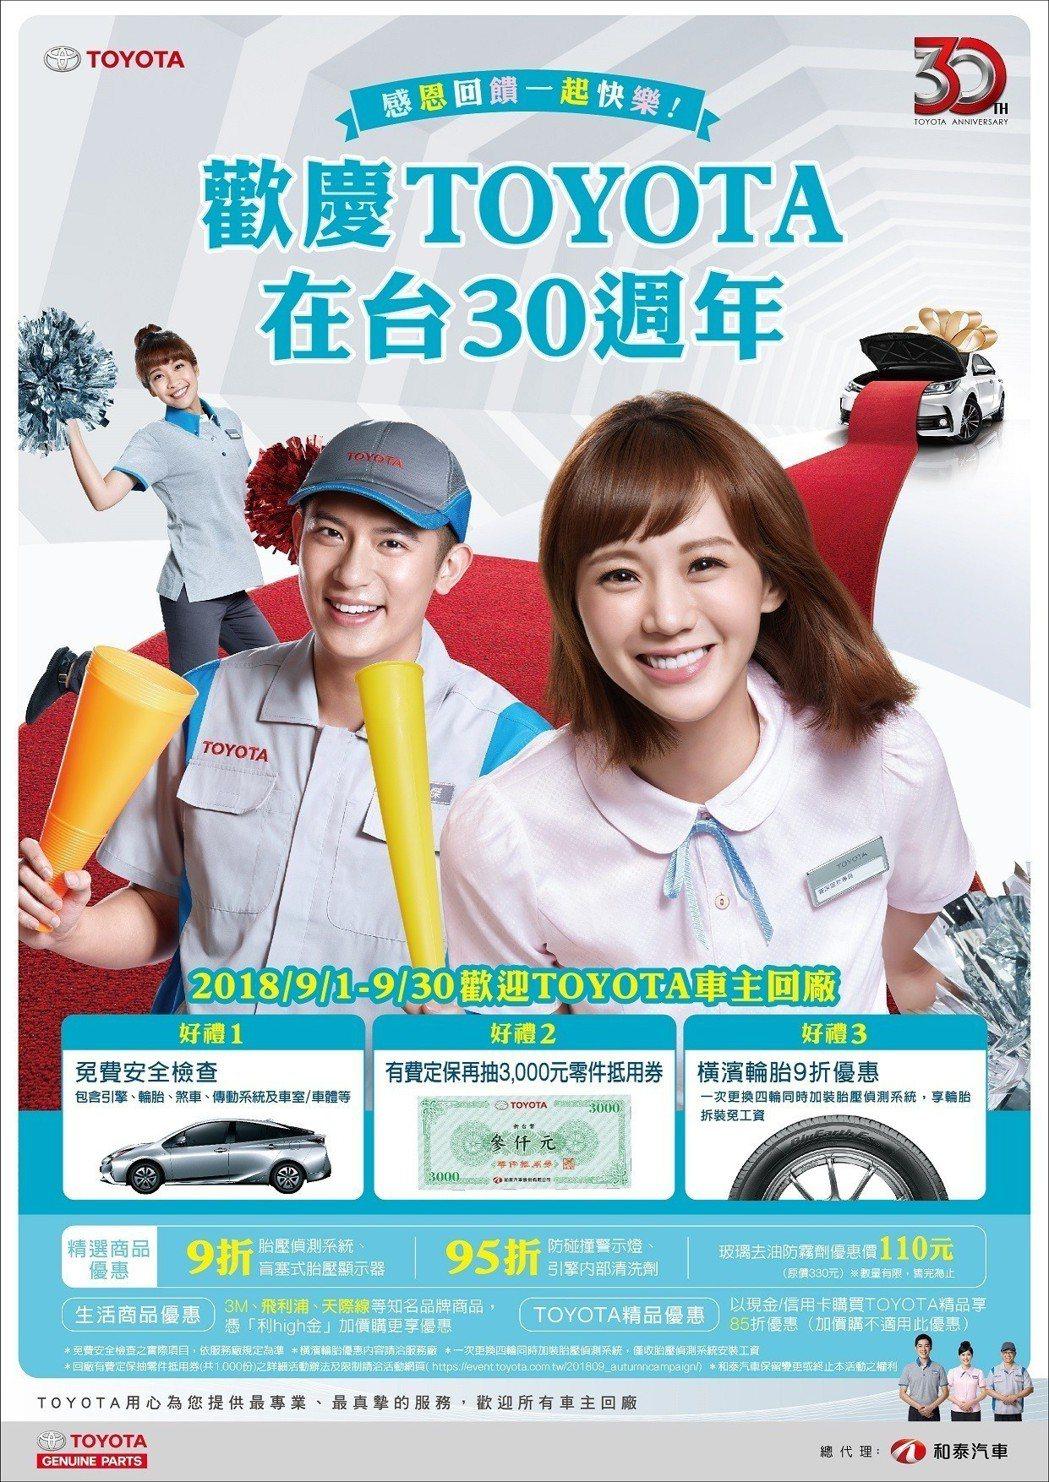 TOYOTA台灣總代理和泰汽車即日起至9月30日,舉辦「歡慶TOYOTA在台30周年–秋季健診」活動。 圖/和泰汽車提供